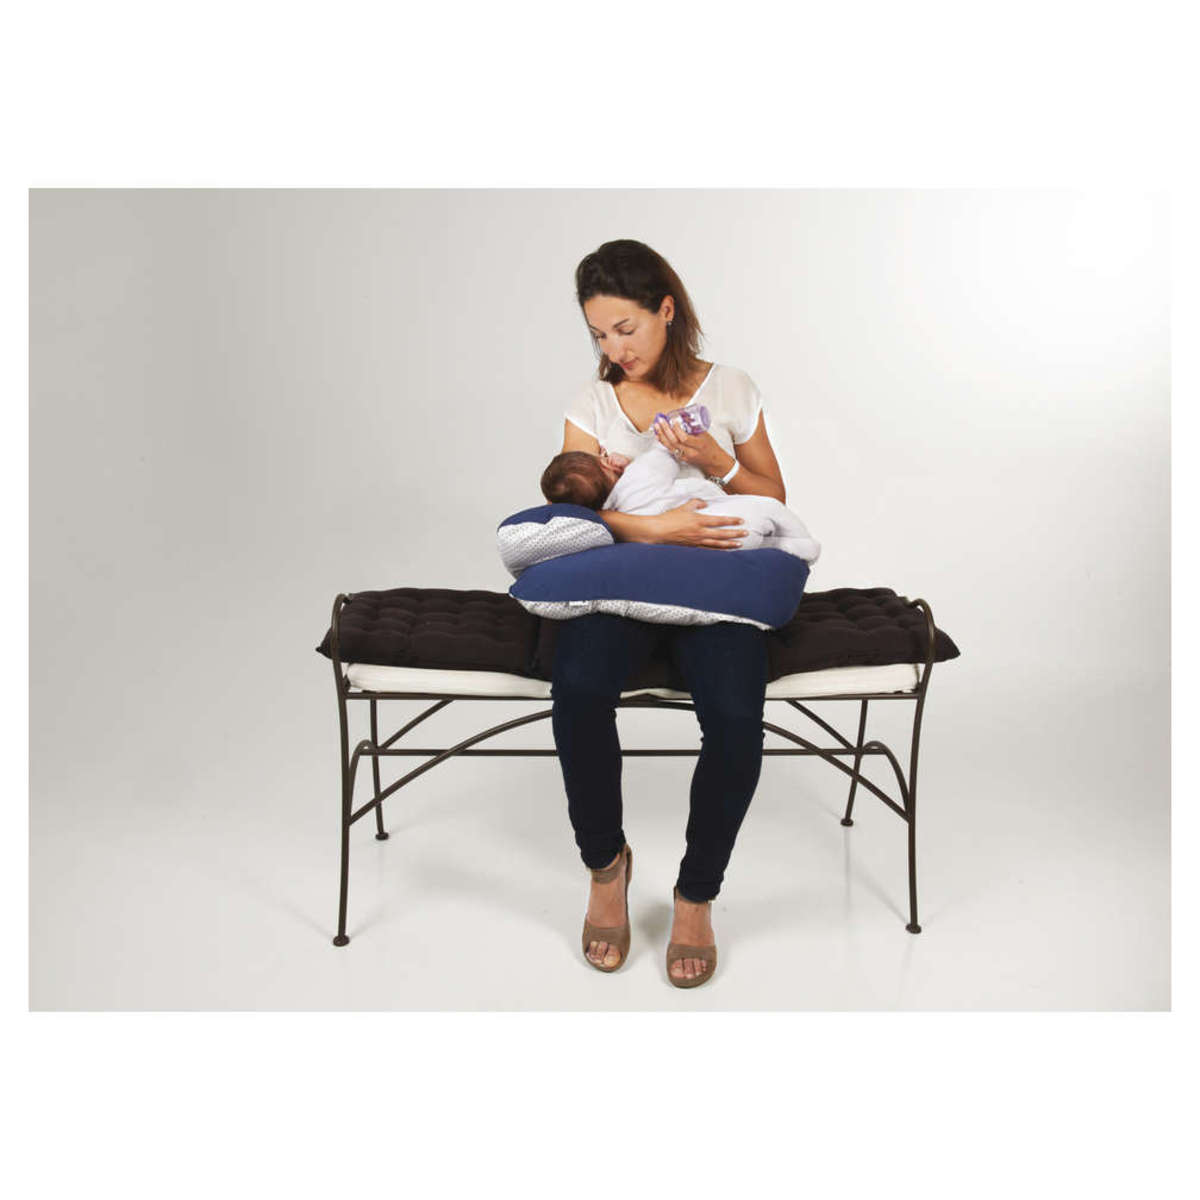 candide coussin d 39 allaitement confort evolutif gris triangles coussin allaitement candide. Black Bedroom Furniture Sets. Home Design Ideas